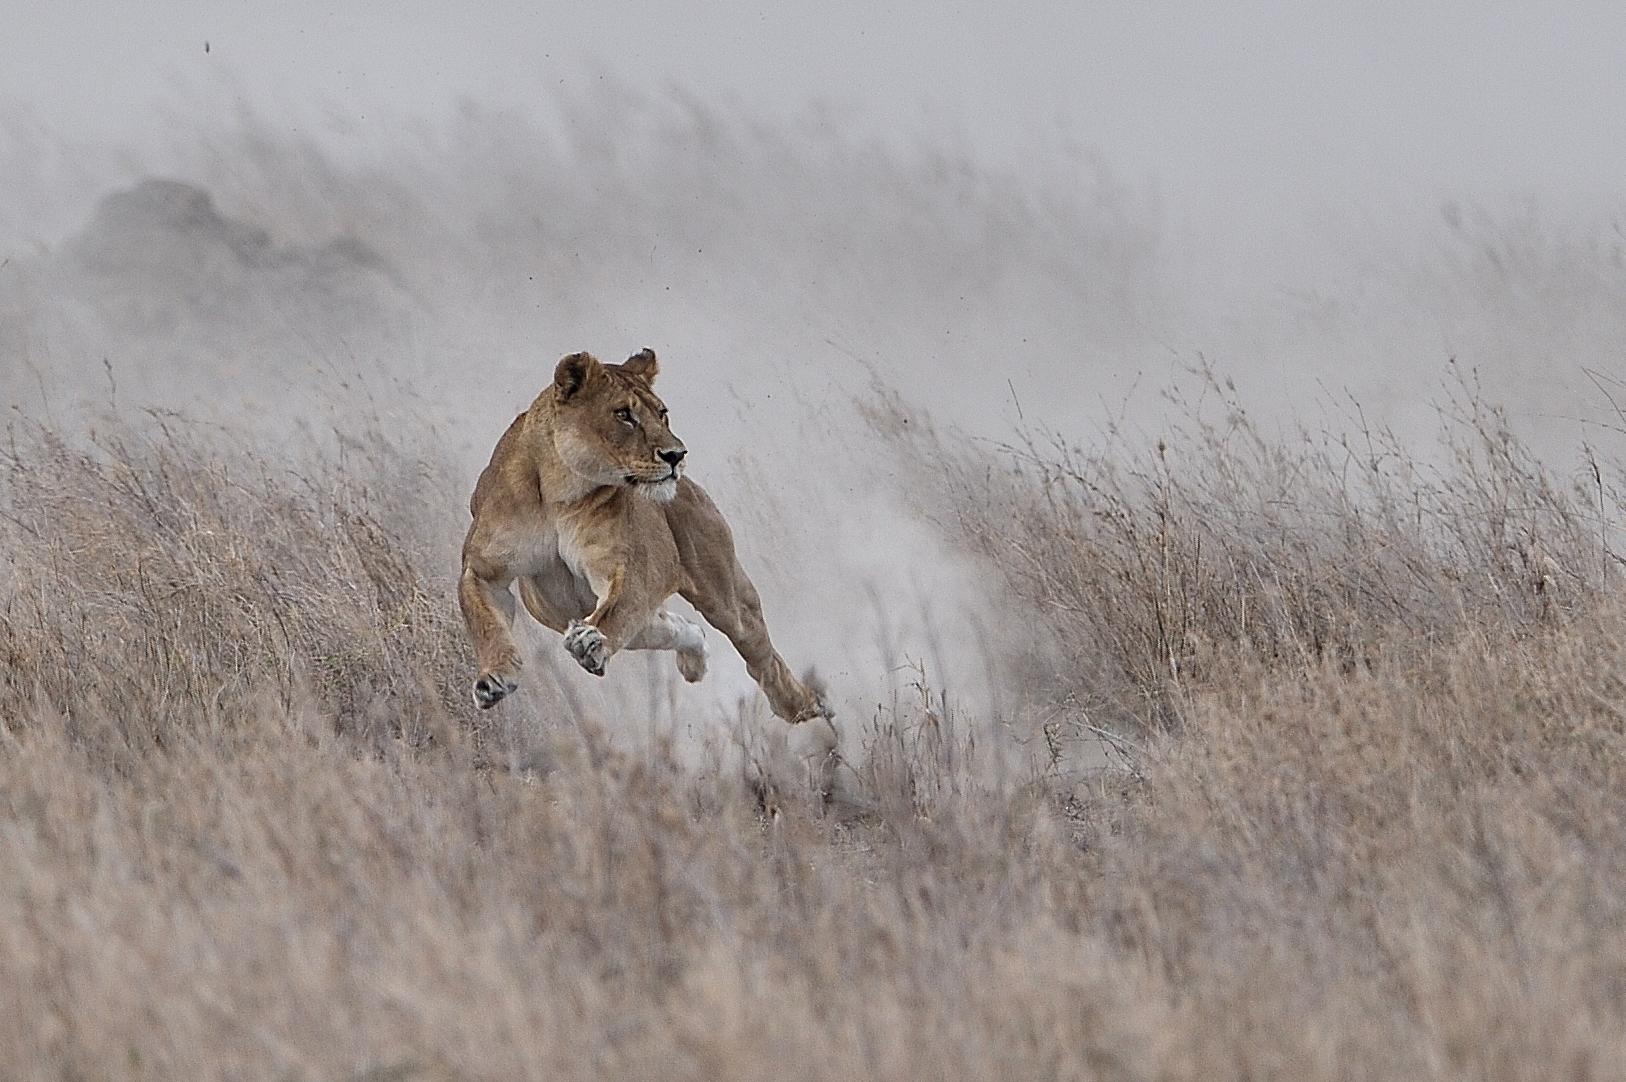 A 'killing combination': lion vs. zebra with the Nikon 600mm f/4E FL & D4S